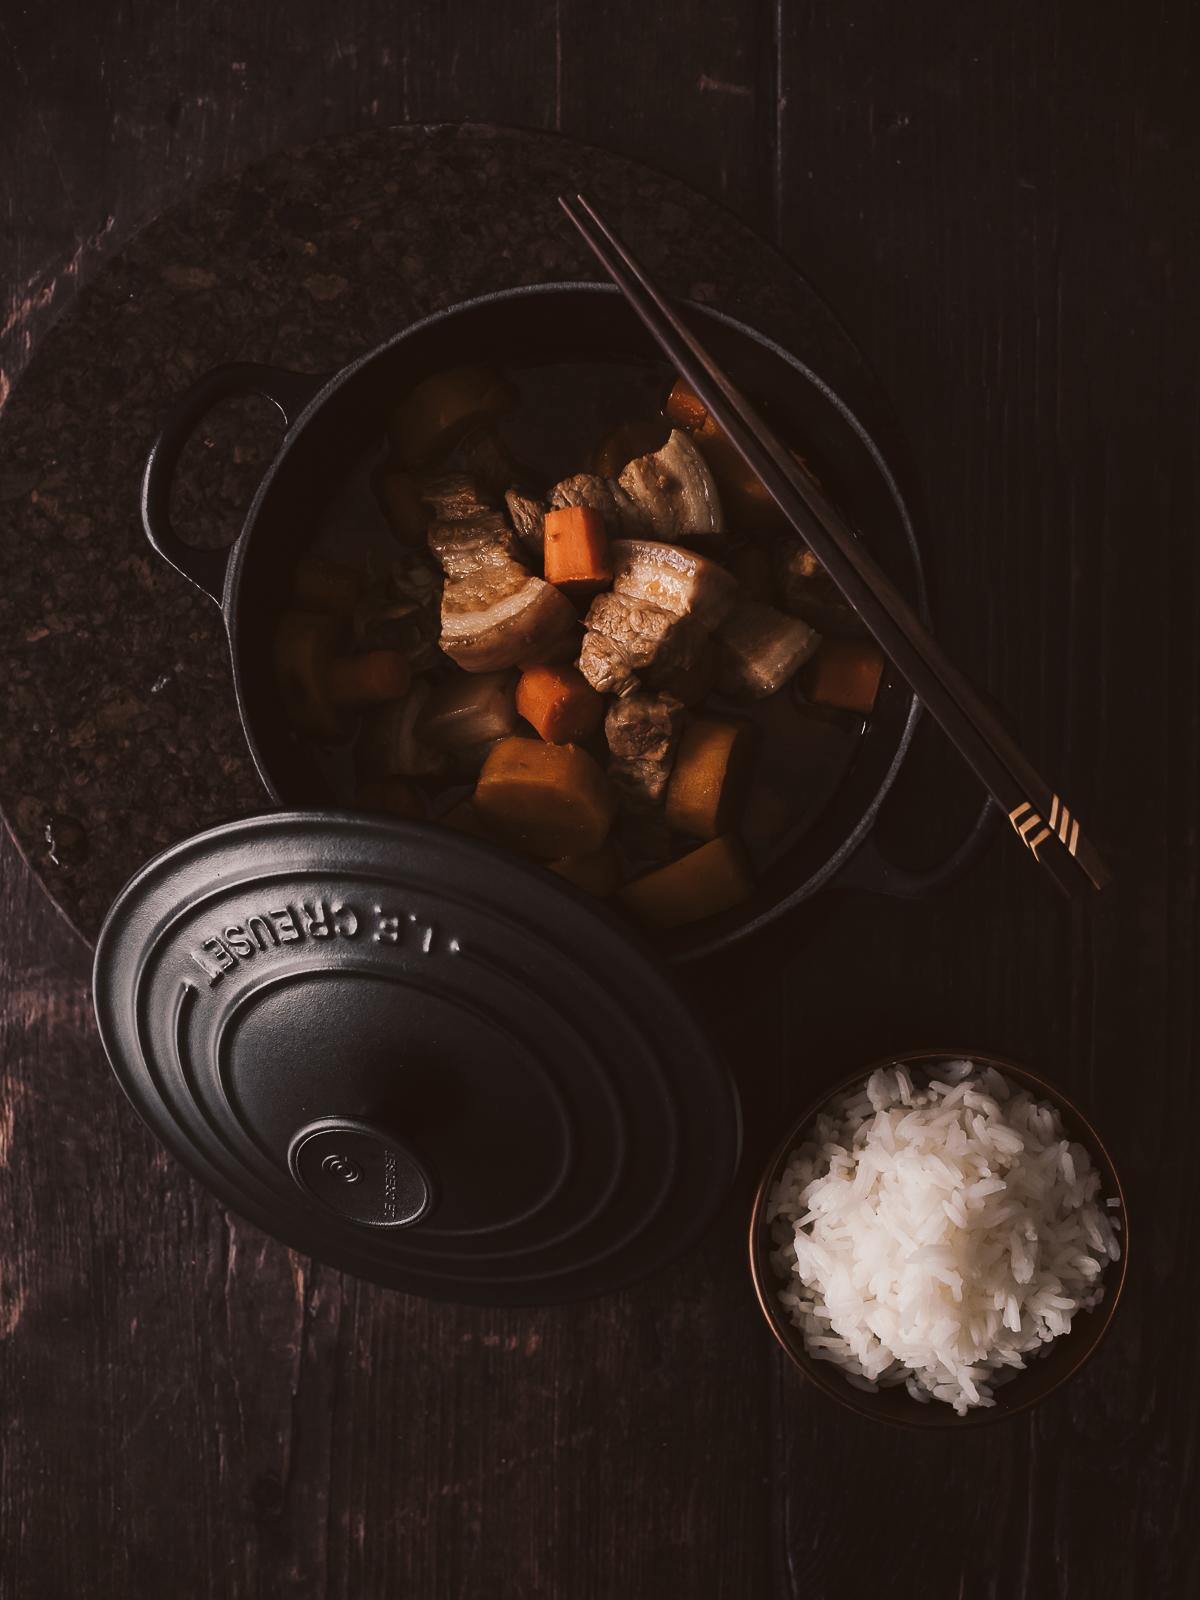 Ingolstadt Village Chinese New Year Lifestyle Shopping & Home Cooking - Olympus EM1Markii 2512 - Yes! Please Enjoy by Fanning Tseng-111.jpg